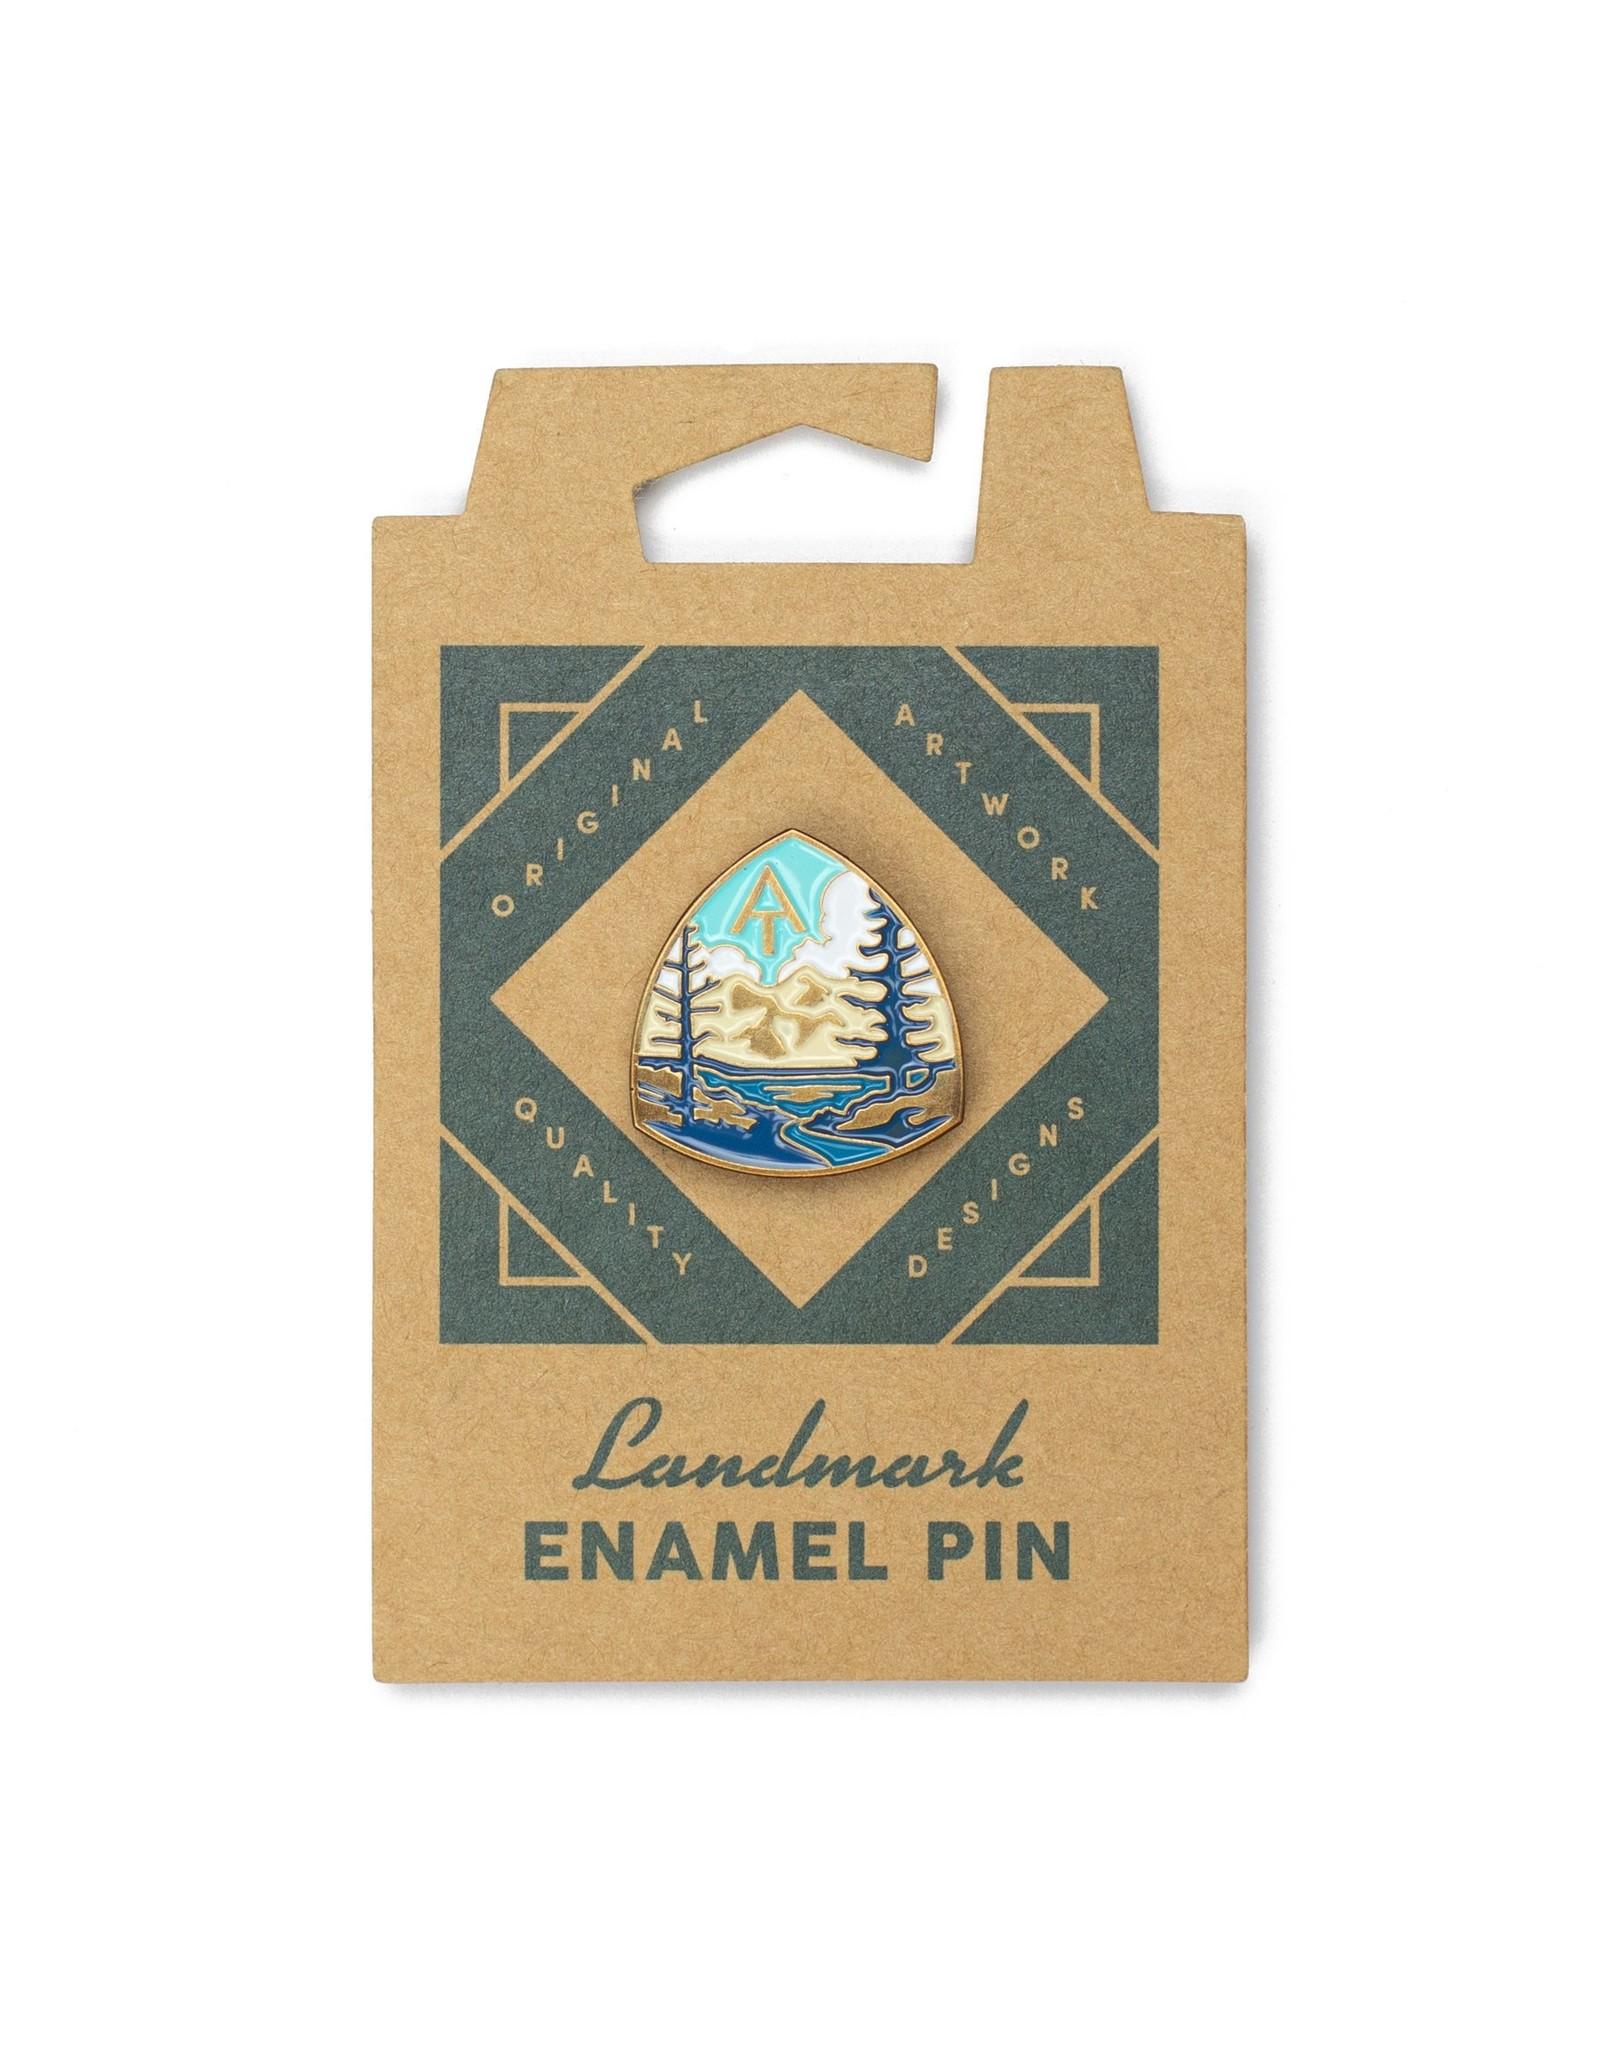 The Landmark Project Appalachian Trail Enamel Pin